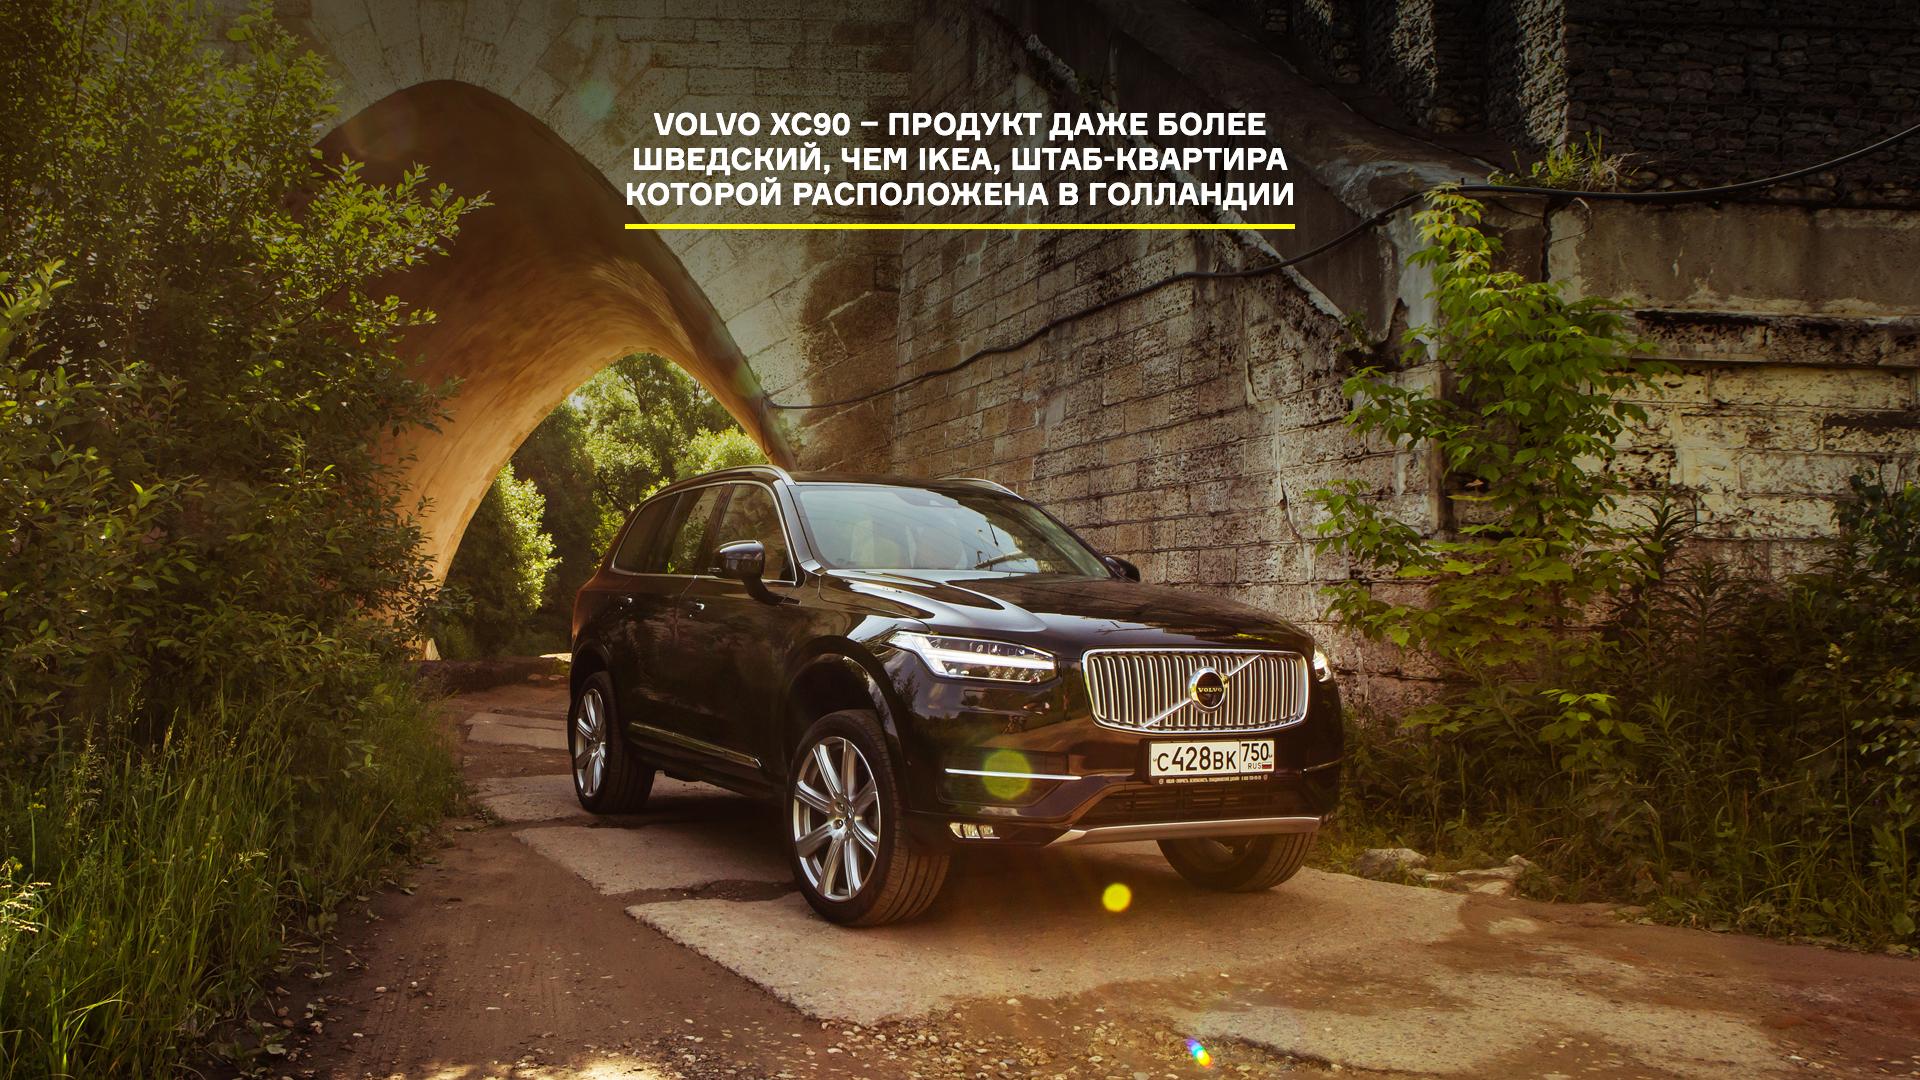 21-дюймовые колеса вроссийских ямах иматрешка вместо рычага «автомата»: тест Volvo XC90. Фото 8